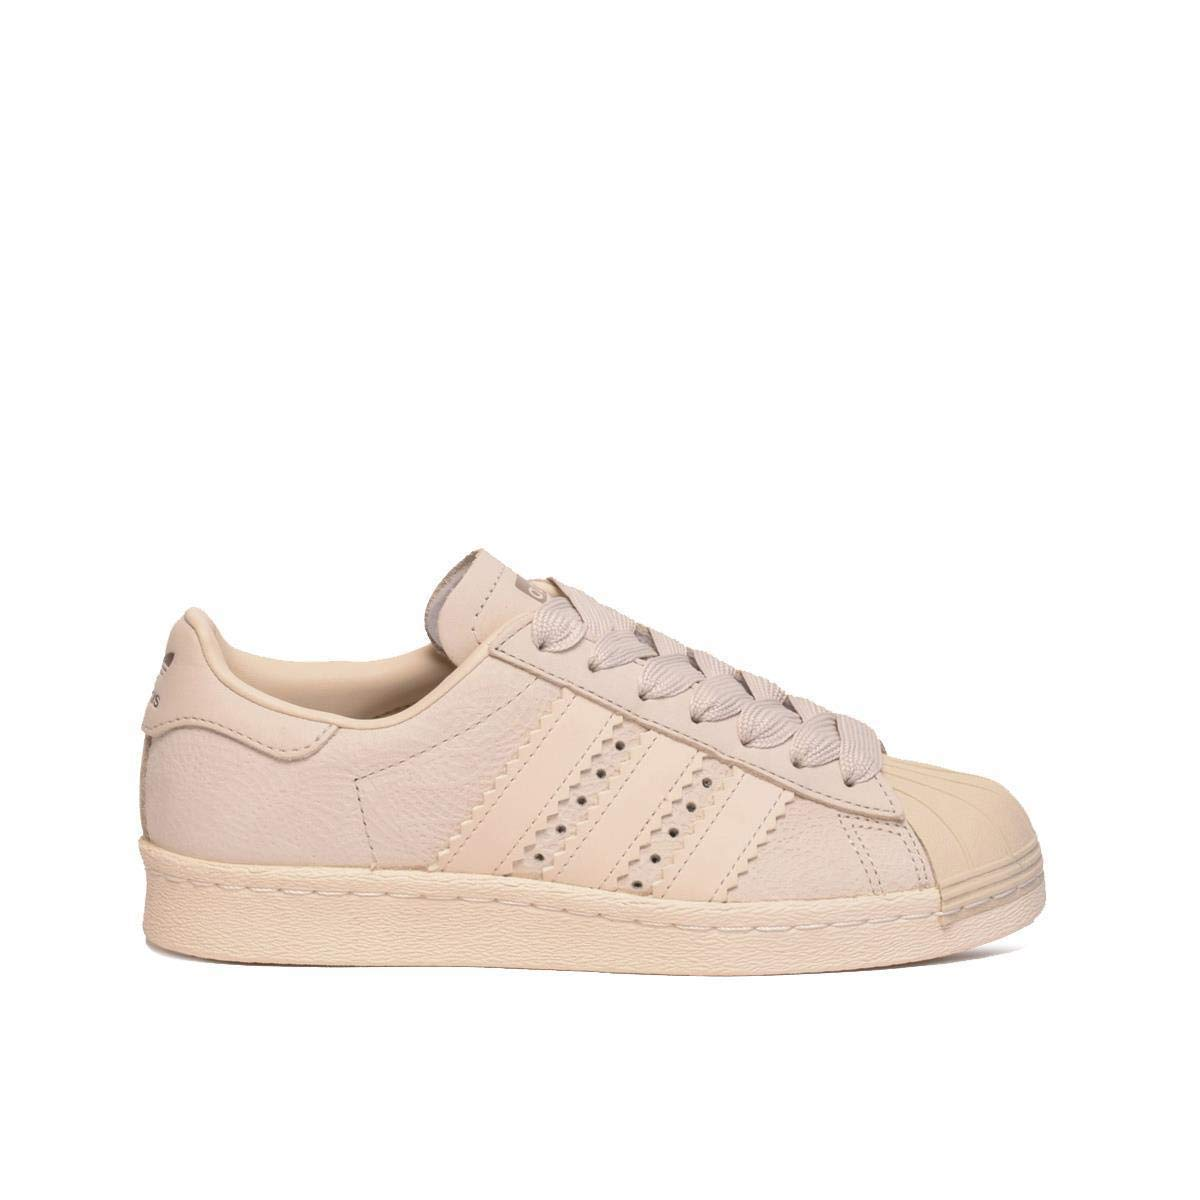 MultiCouleure (Marcla Marcla Casbla 000) 44 2 3 EU adidas Superstar 80s W, Chaussures de Fitness Femme